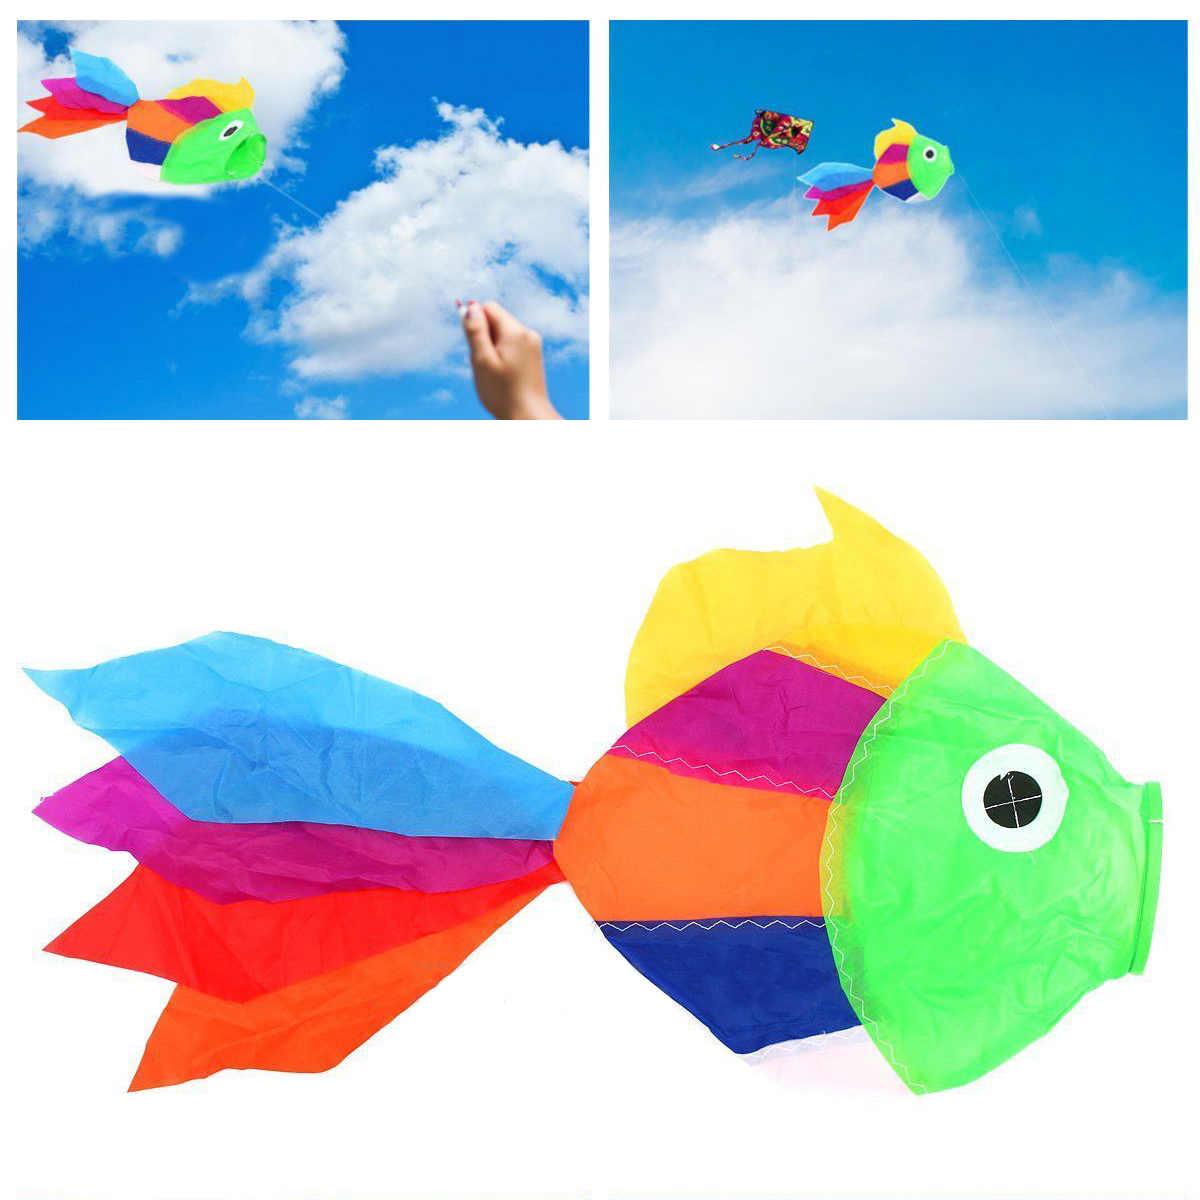 JX-LCLYL Arco Iris pez Windsock Streamer Kite deportes al aire libre jardín tienda Festival bandera nuevo